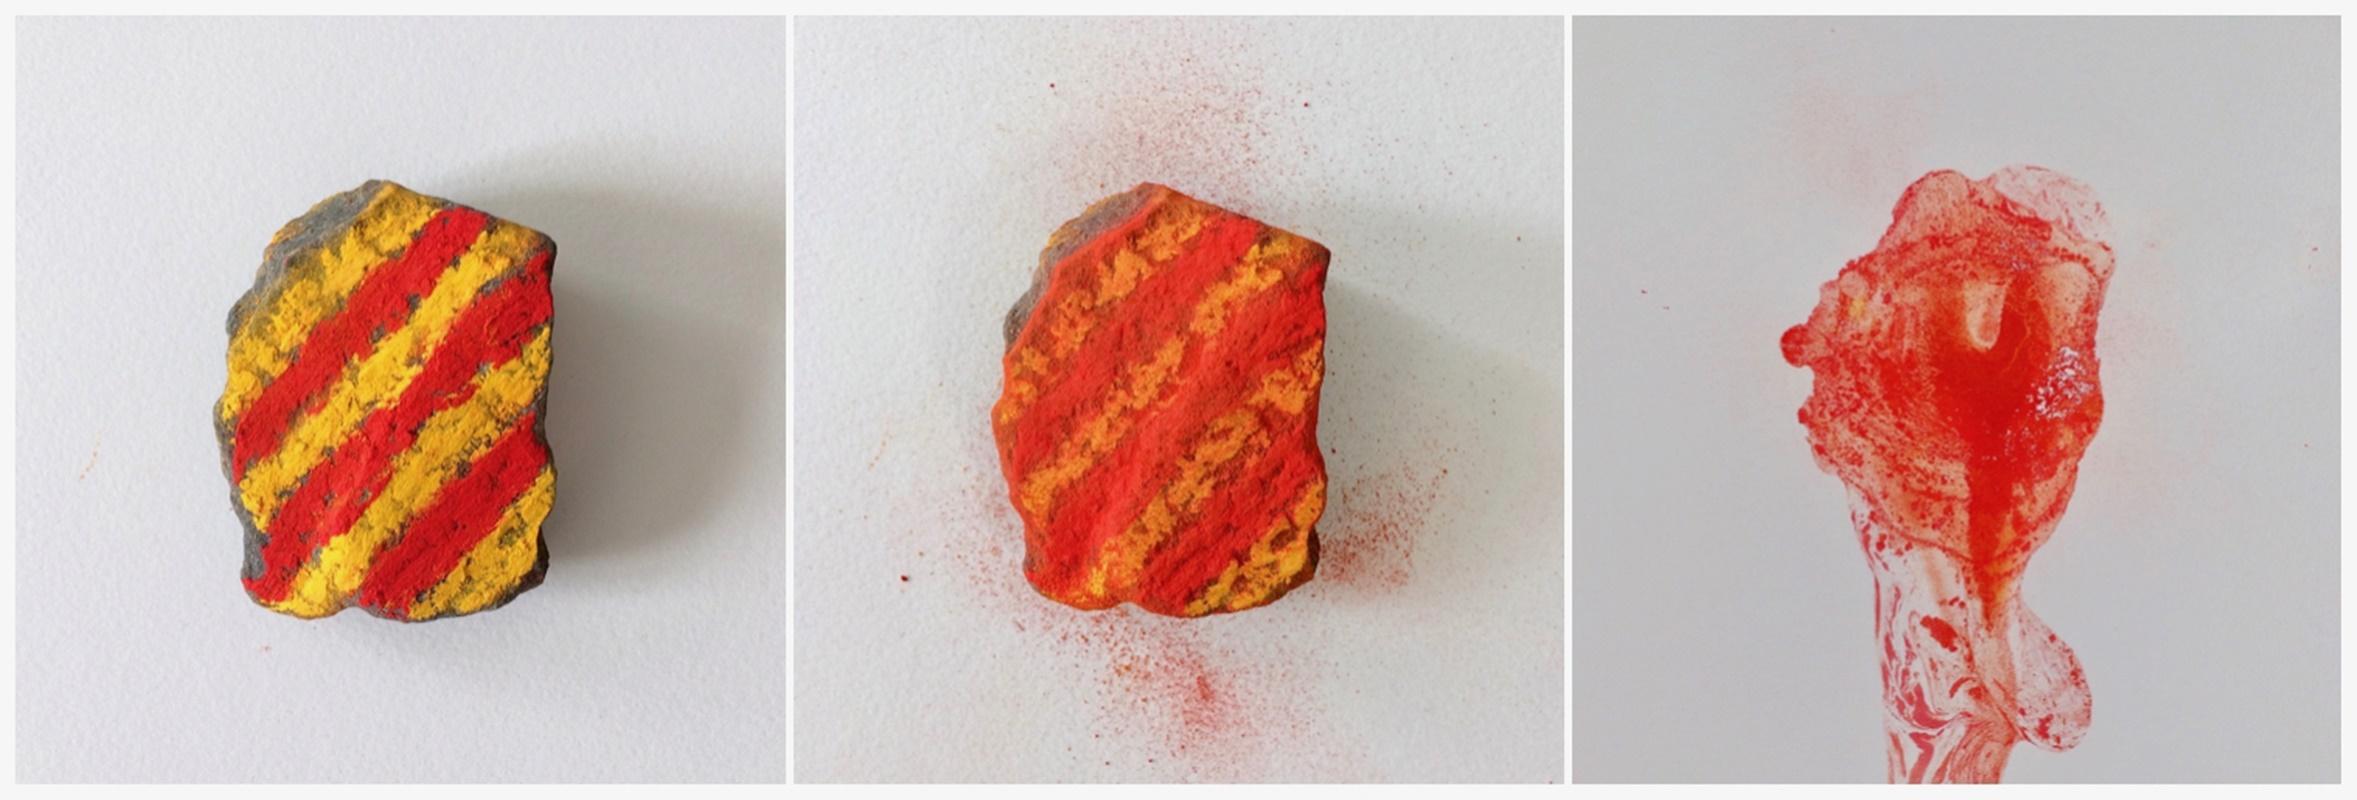 Experiments: stone, color pigments, water // Kokeiluja: kivi, väripigmentit, vesi, 2021